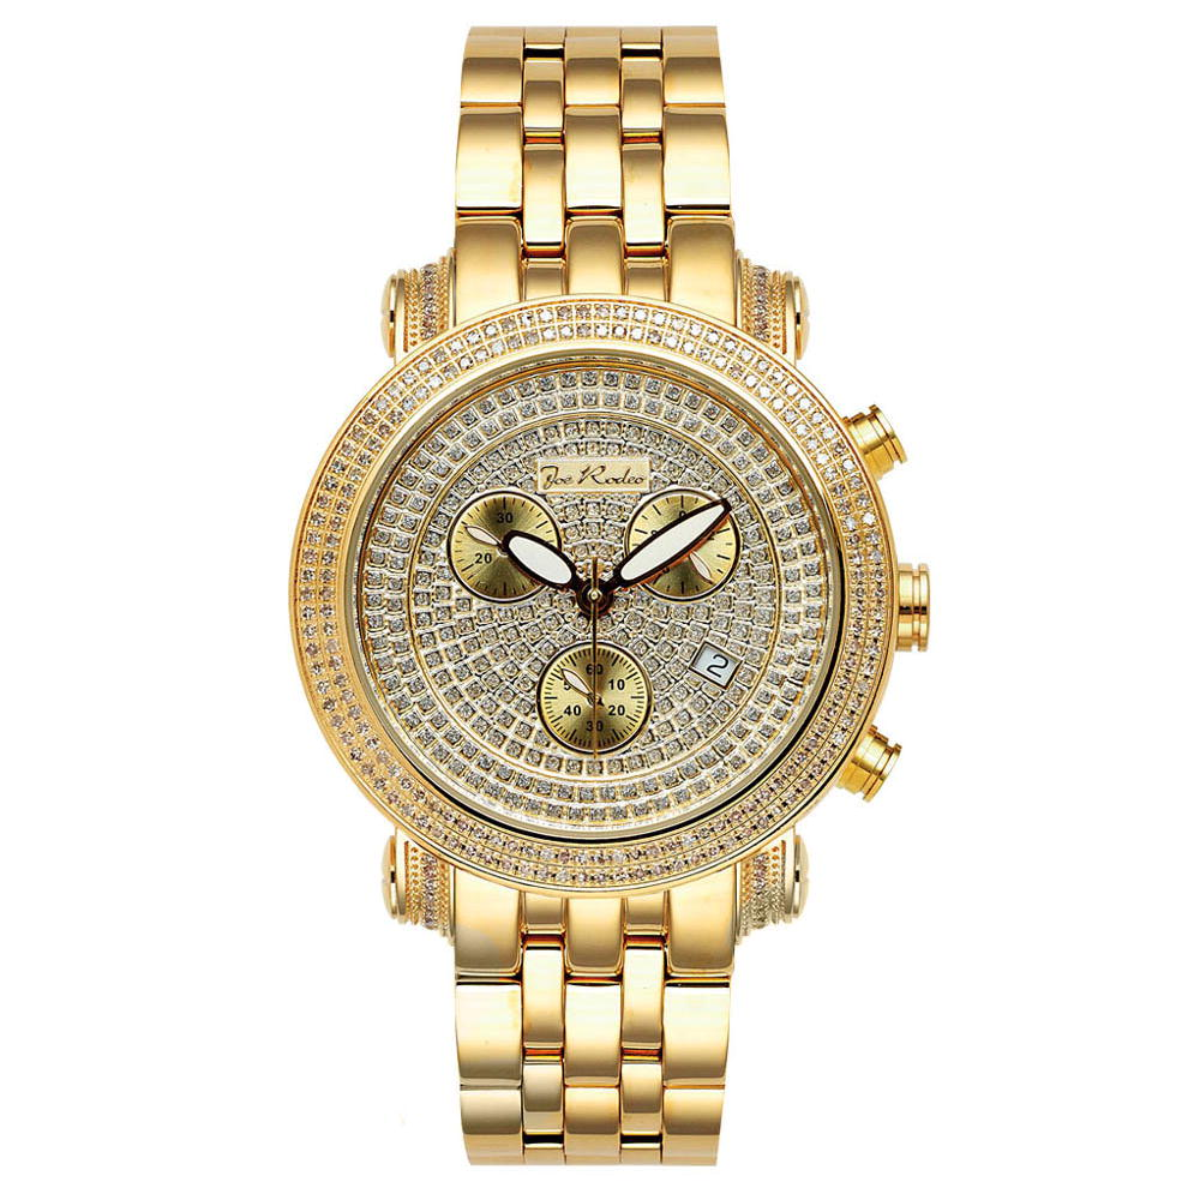 JoJo Watch: Diamond Joe Rodeo Watch 1.75ct Yellow Gold Classic